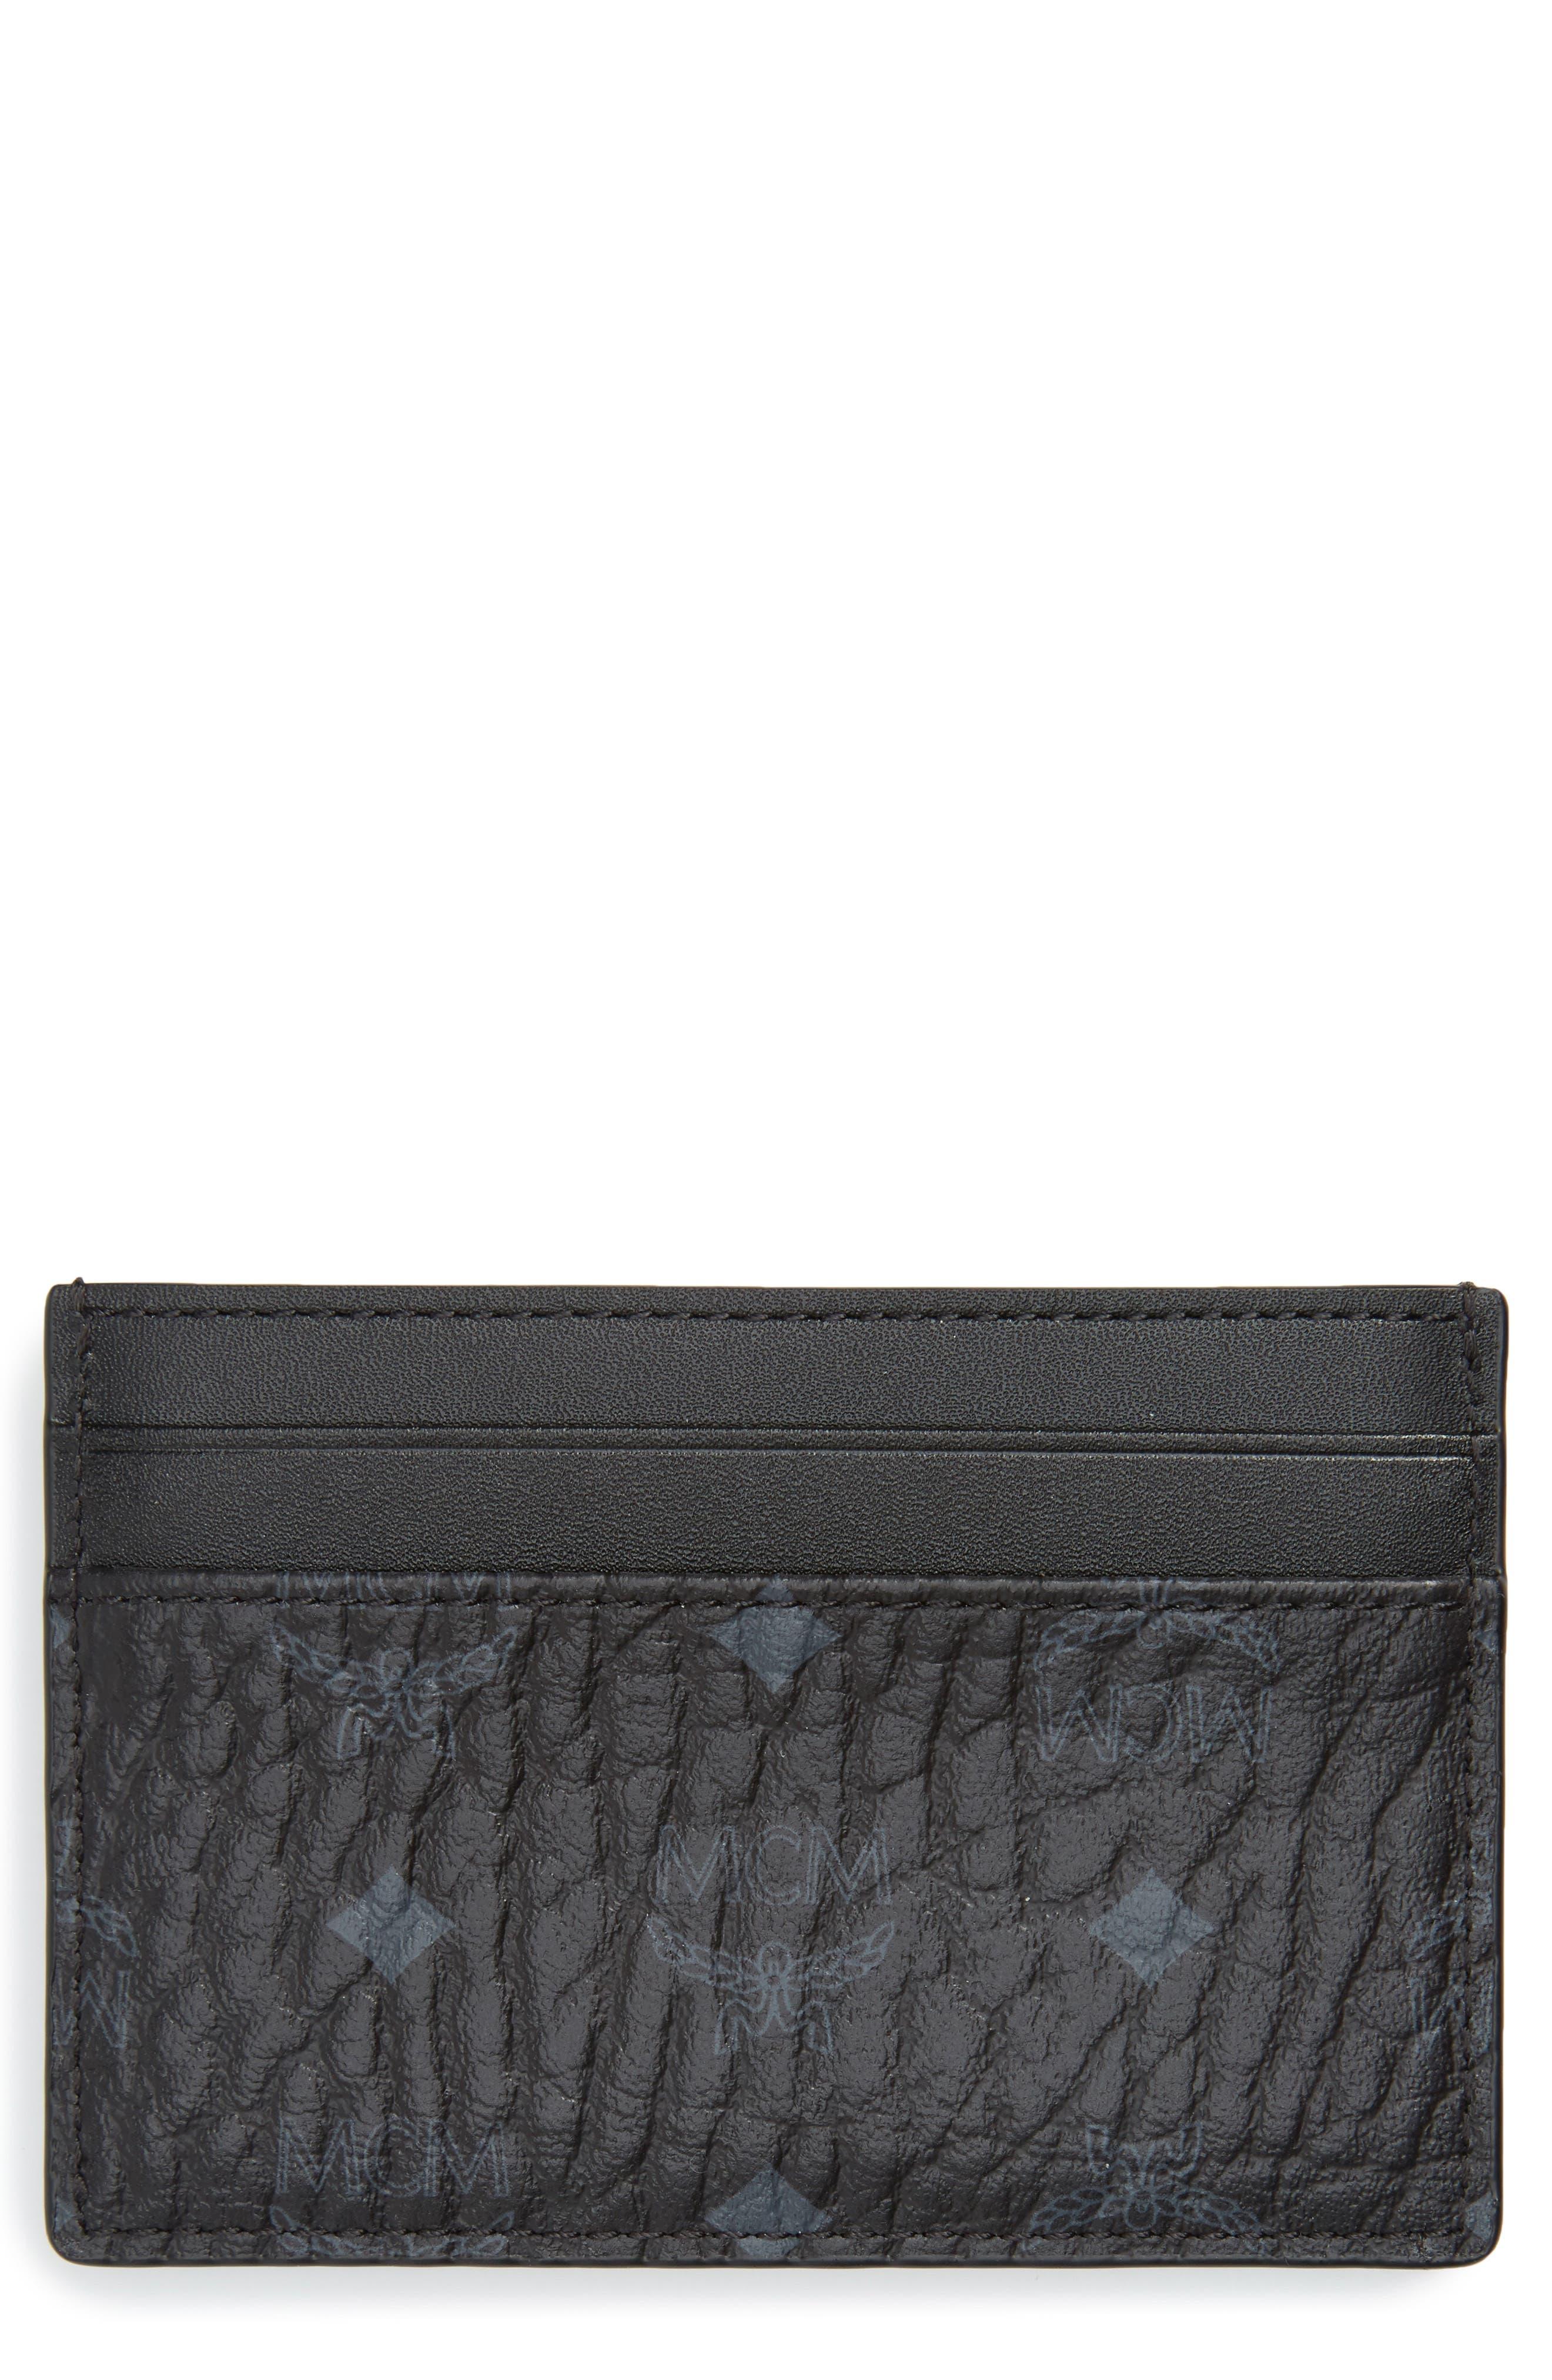 MCM Logo Leather Card Case